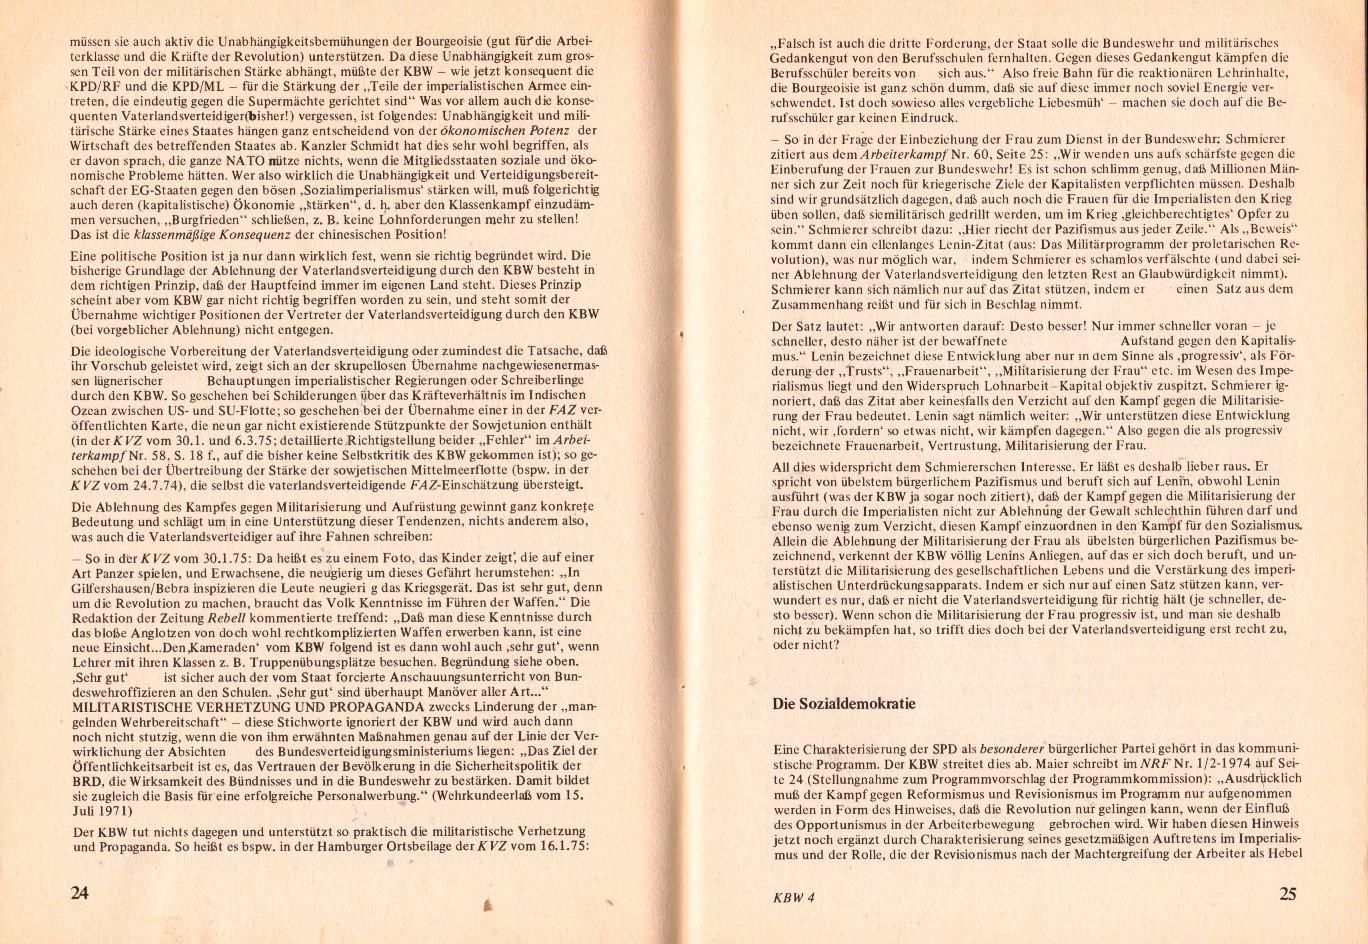 Spartacus_1975_Kritik_des_KBW_14